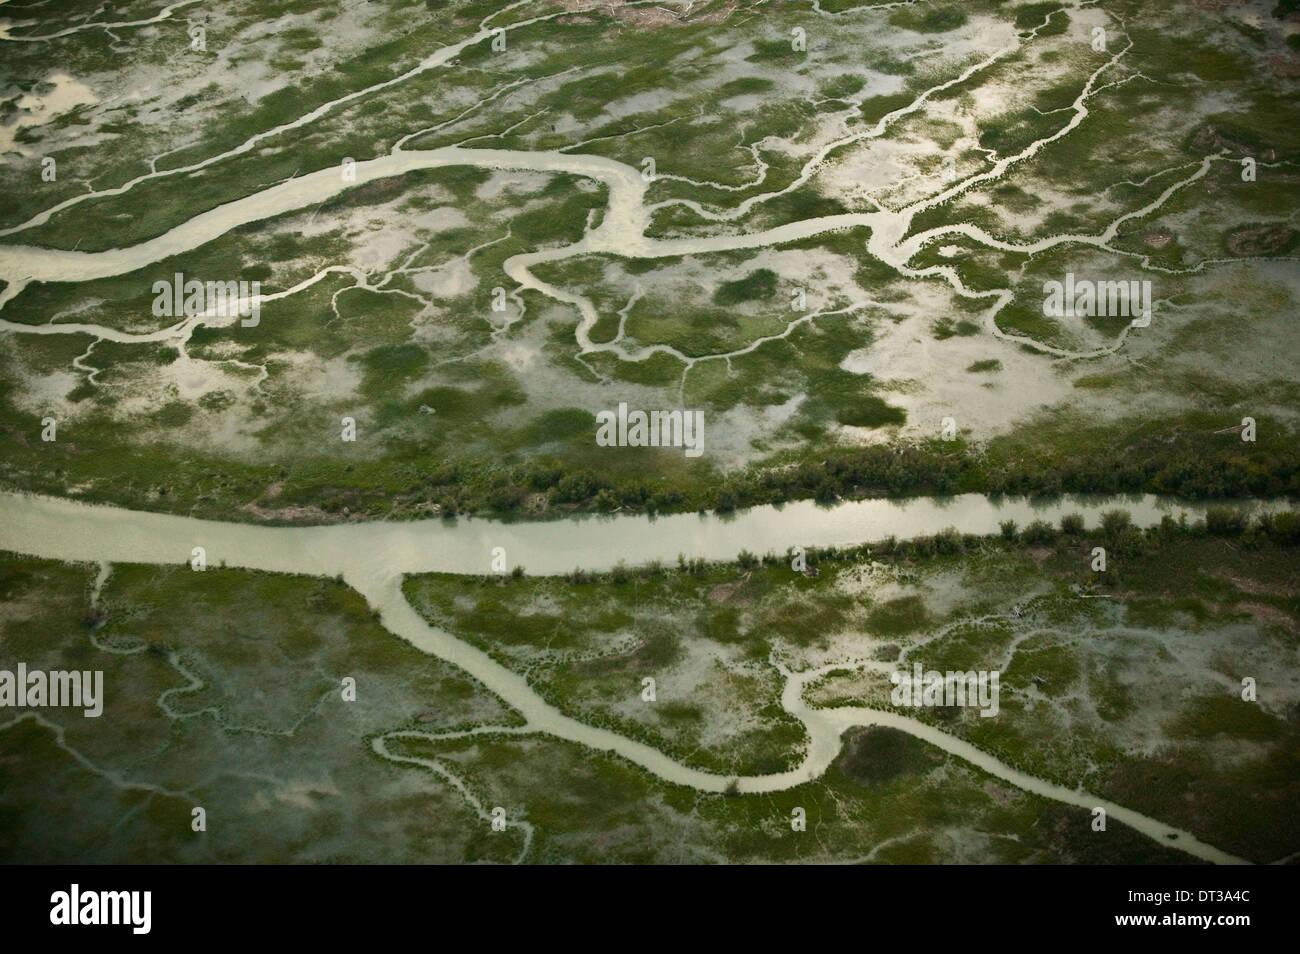 Luftaufnahme des Fraser River Delta, British Columbia, Kanada Stockbild